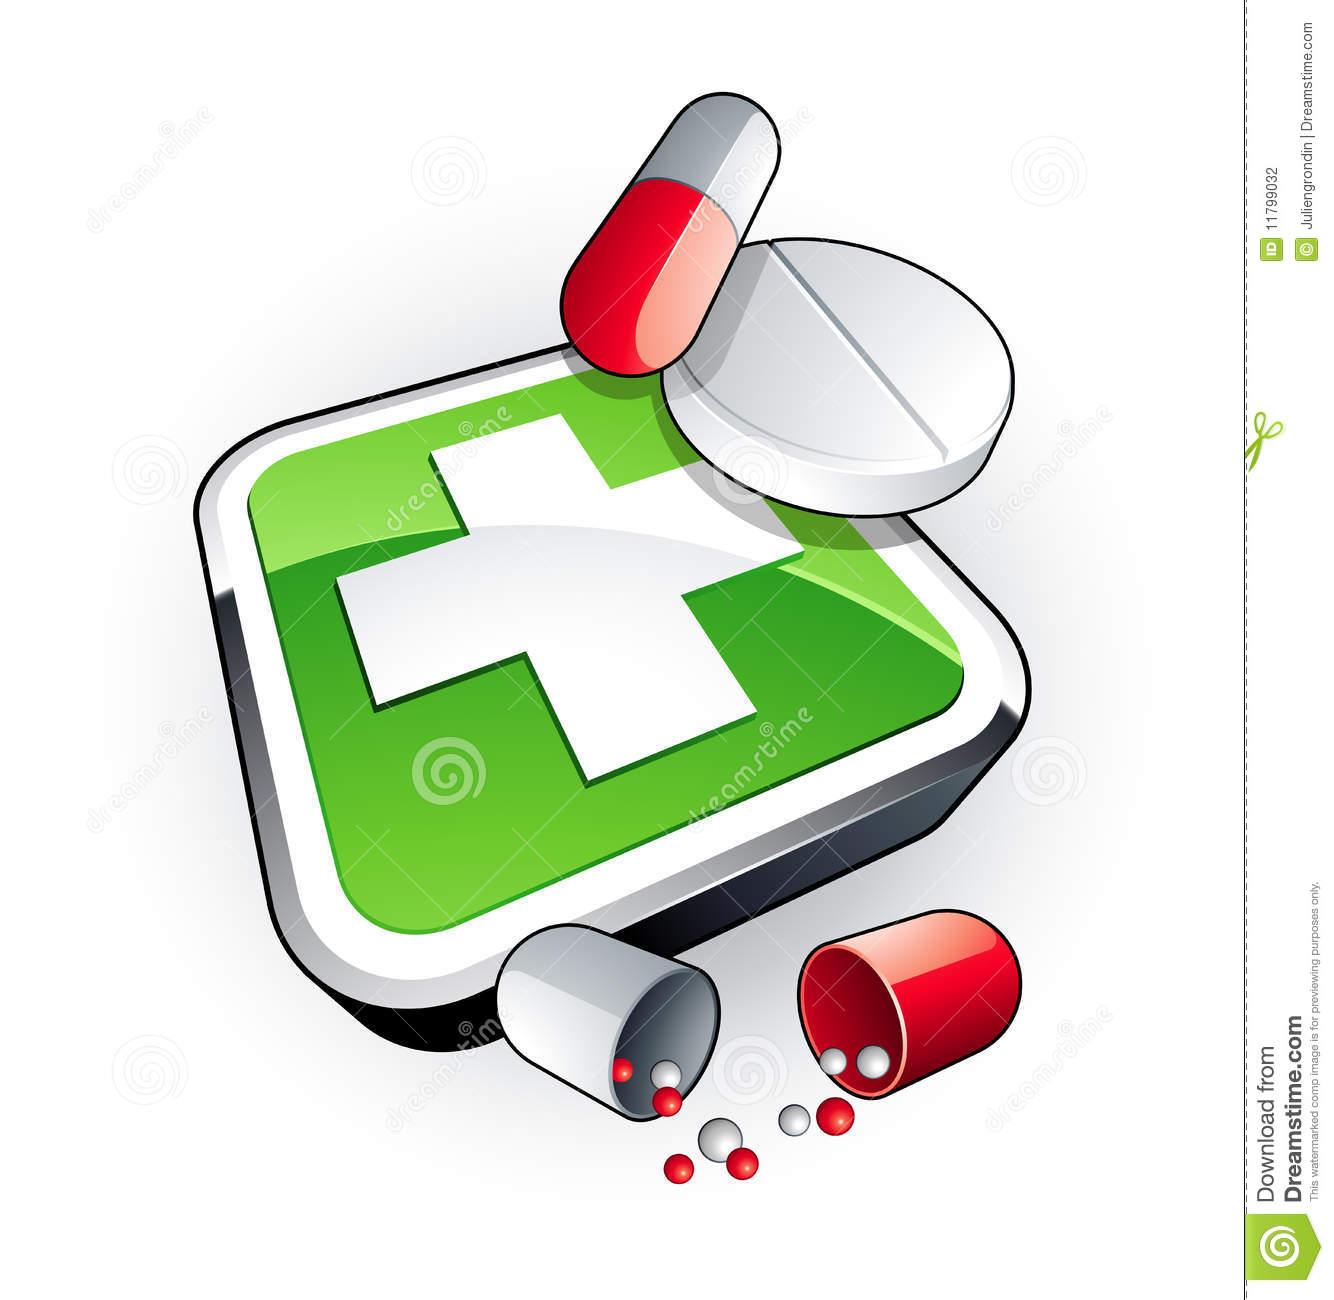 Medical panda free images. Medicine clipart